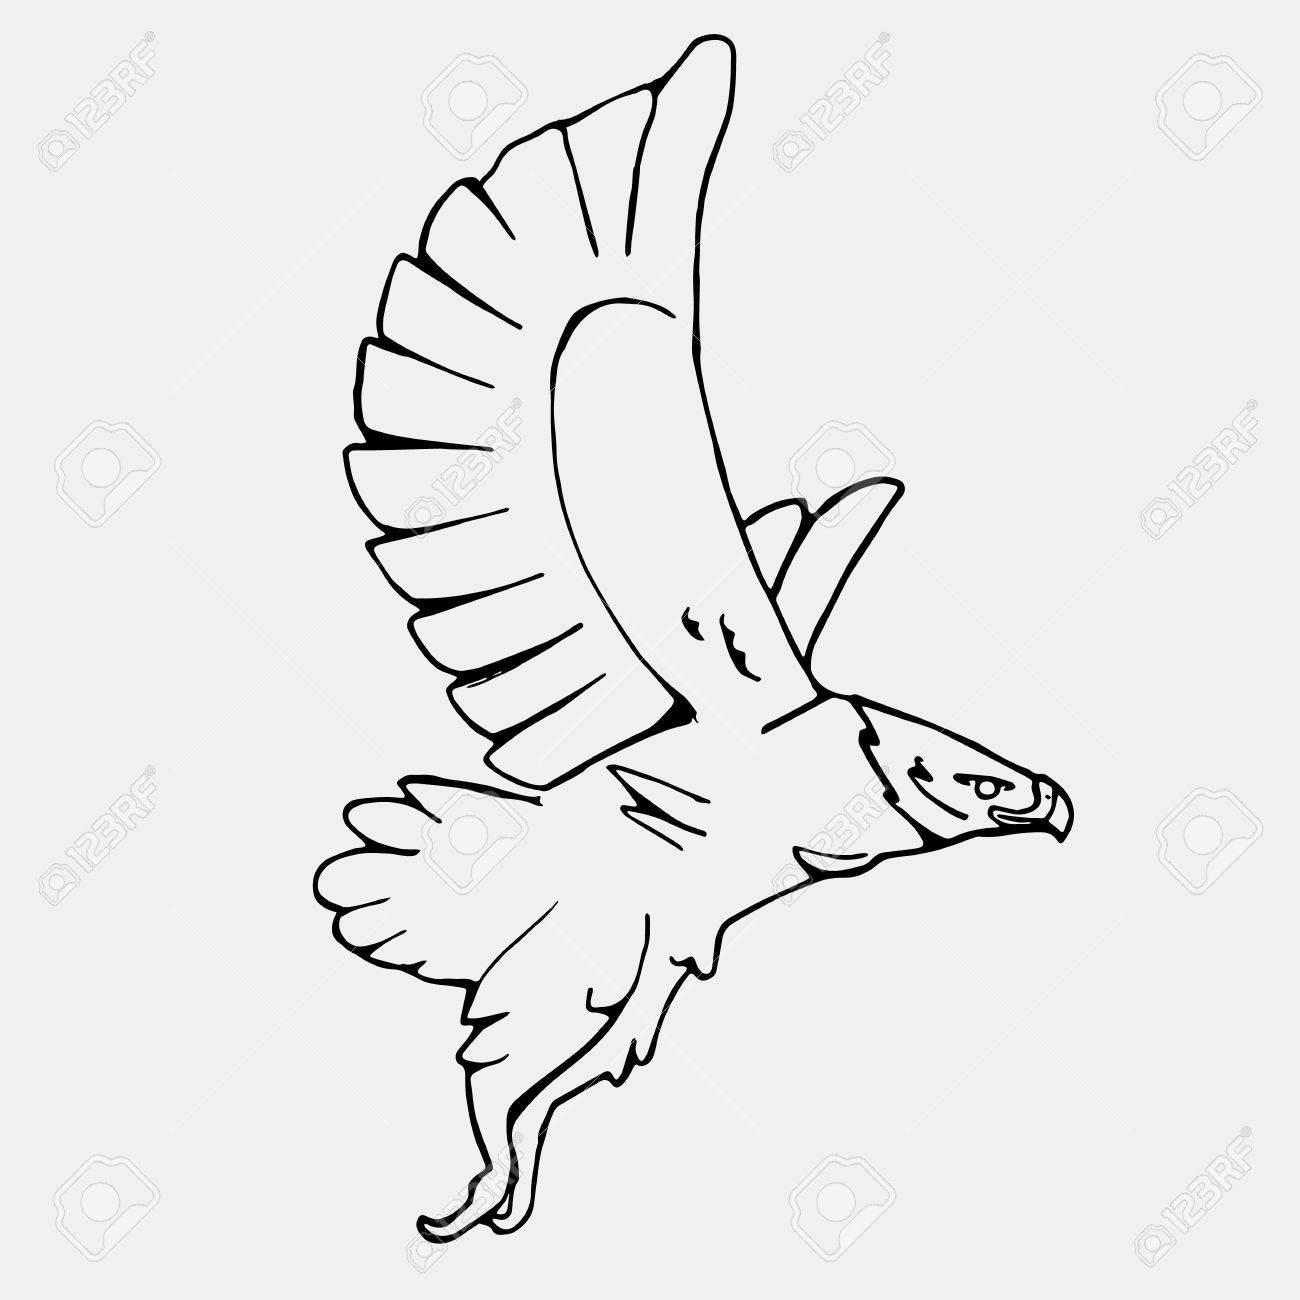 Hand-drawn Pencil Graphics, Vulture, Eagle, Osprey, Falcon, Hawk ...